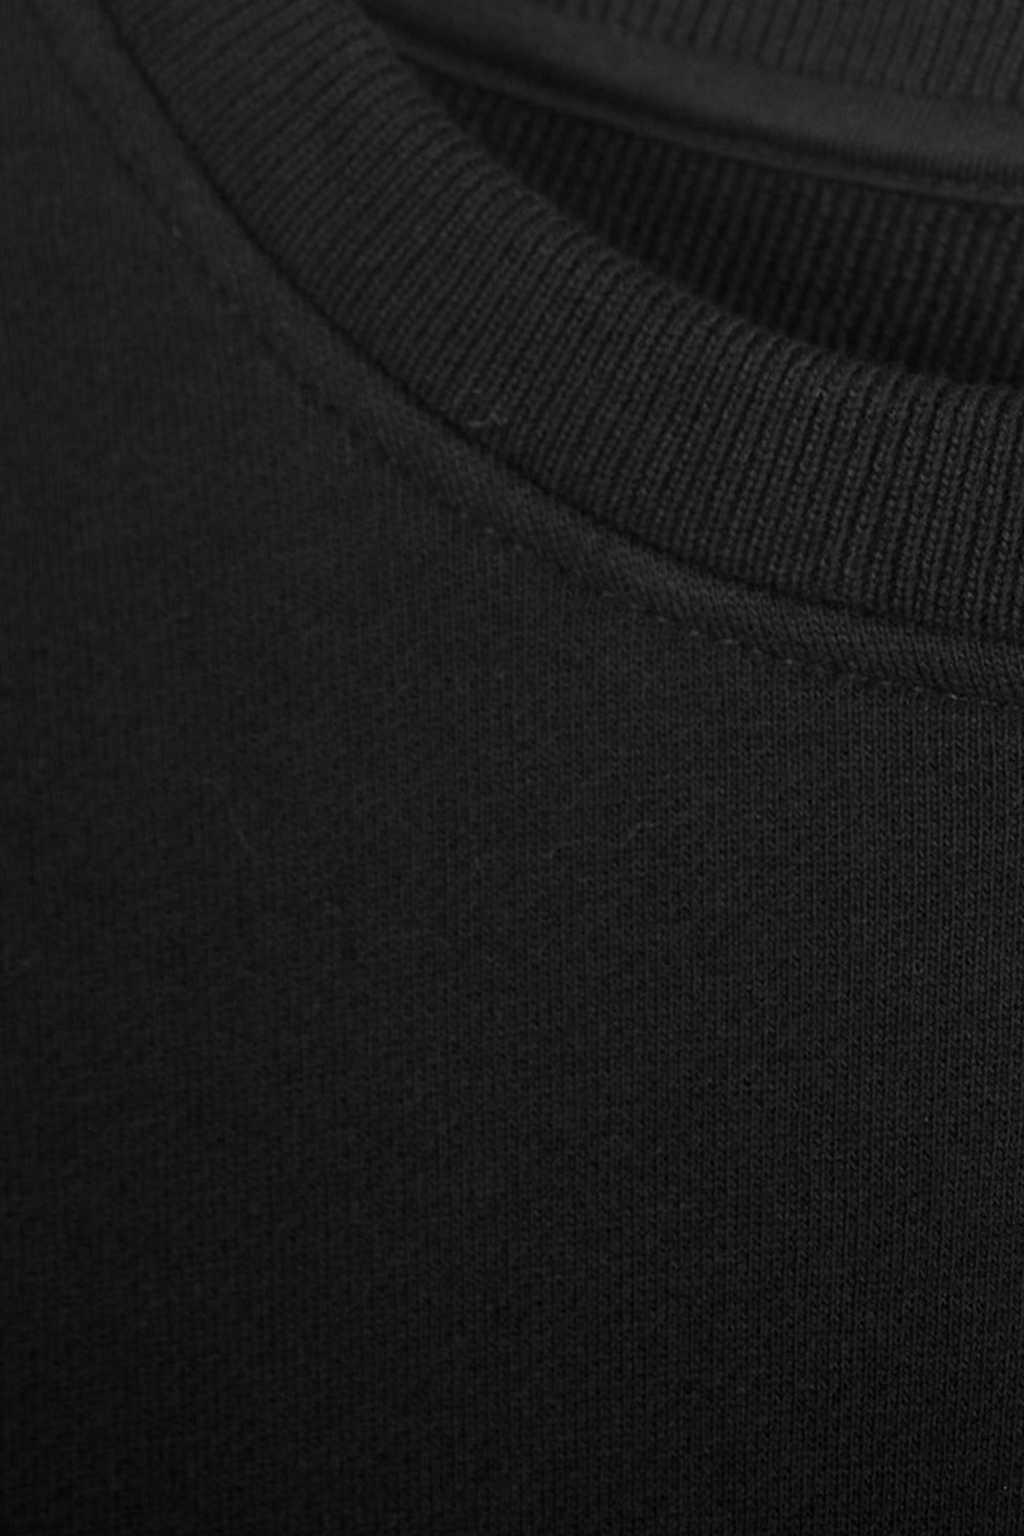 Sweatshirt 1413 Black 6